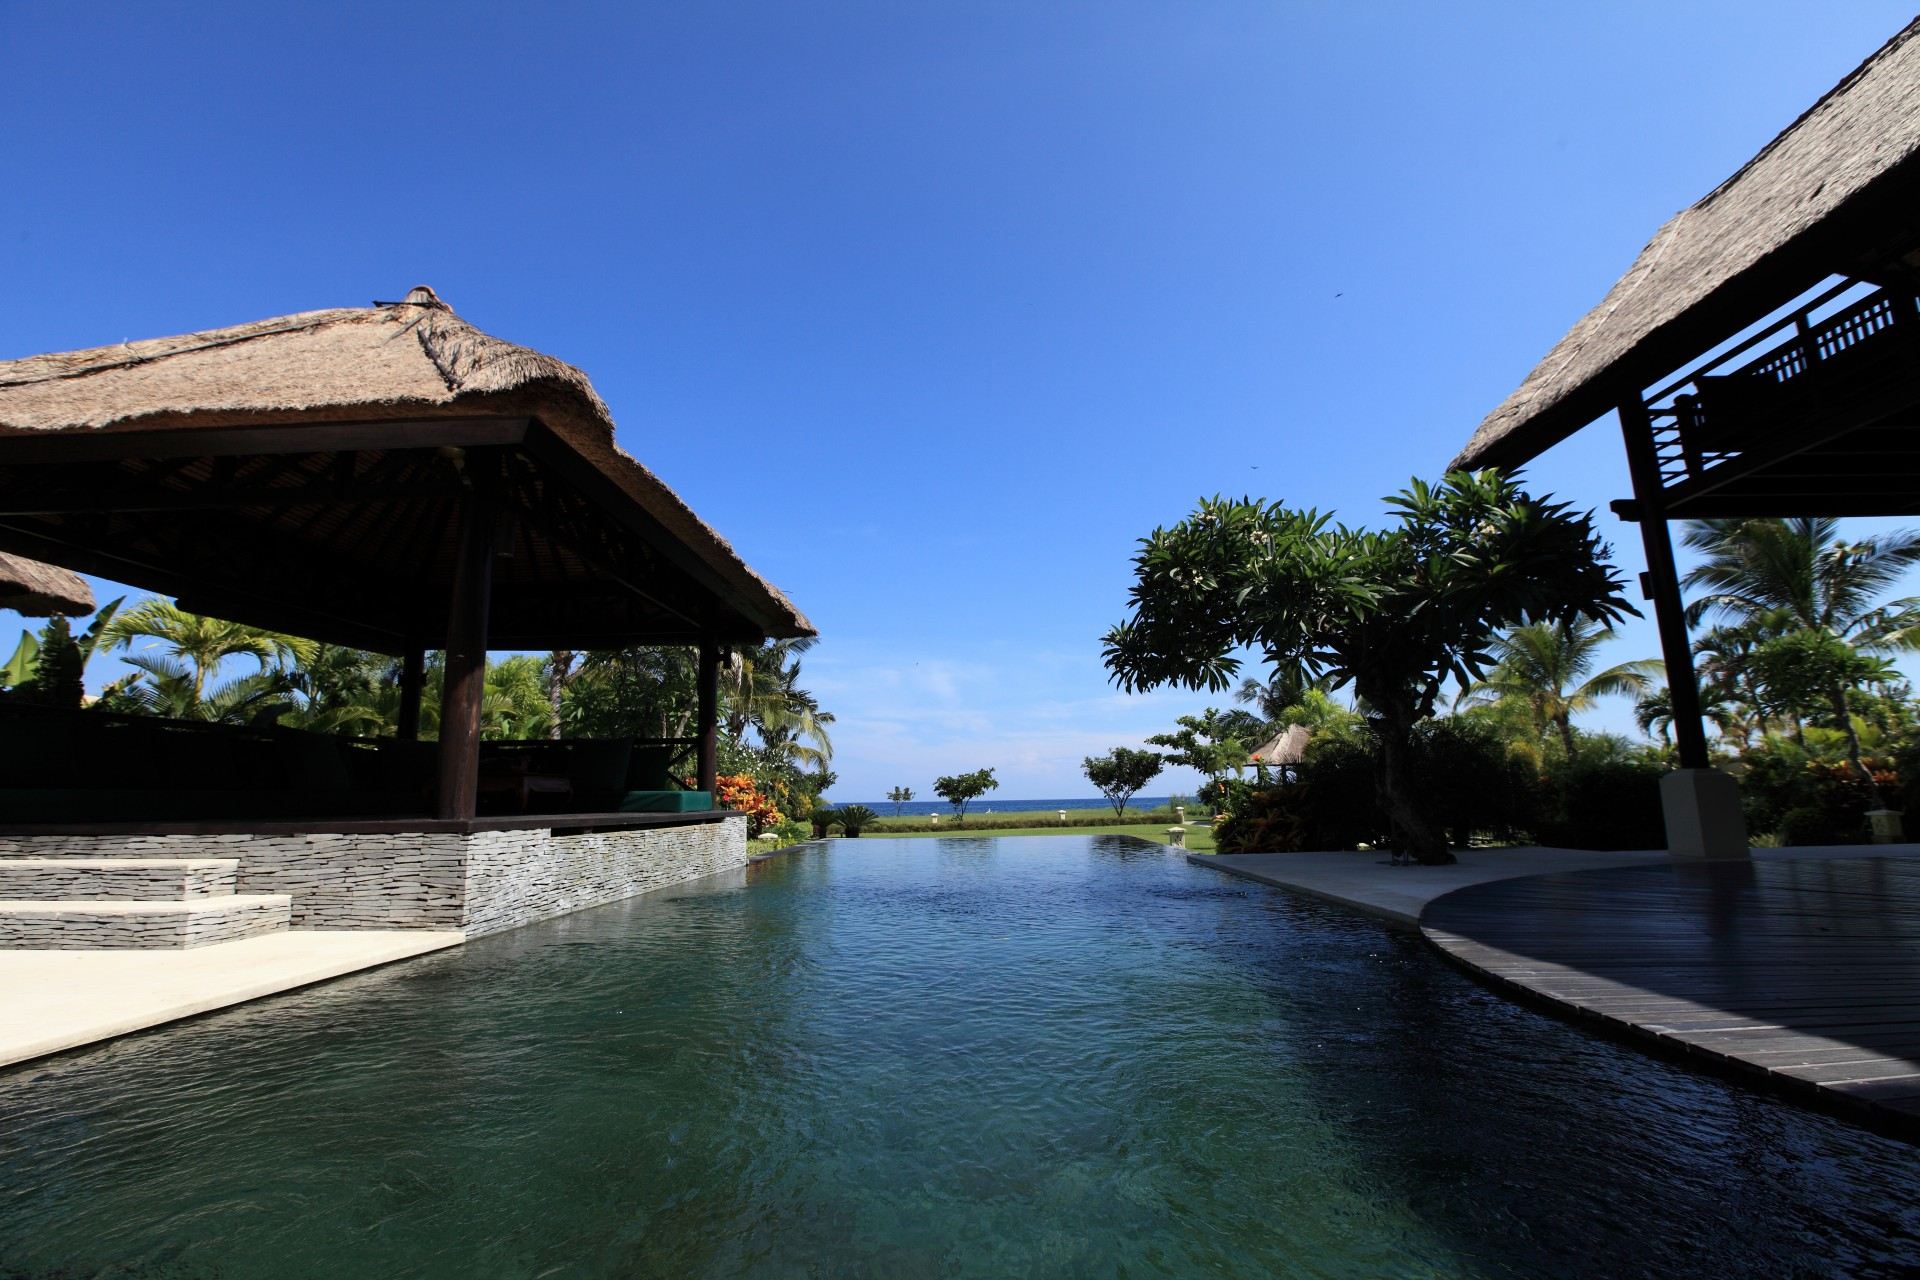 zwembad uitzicht